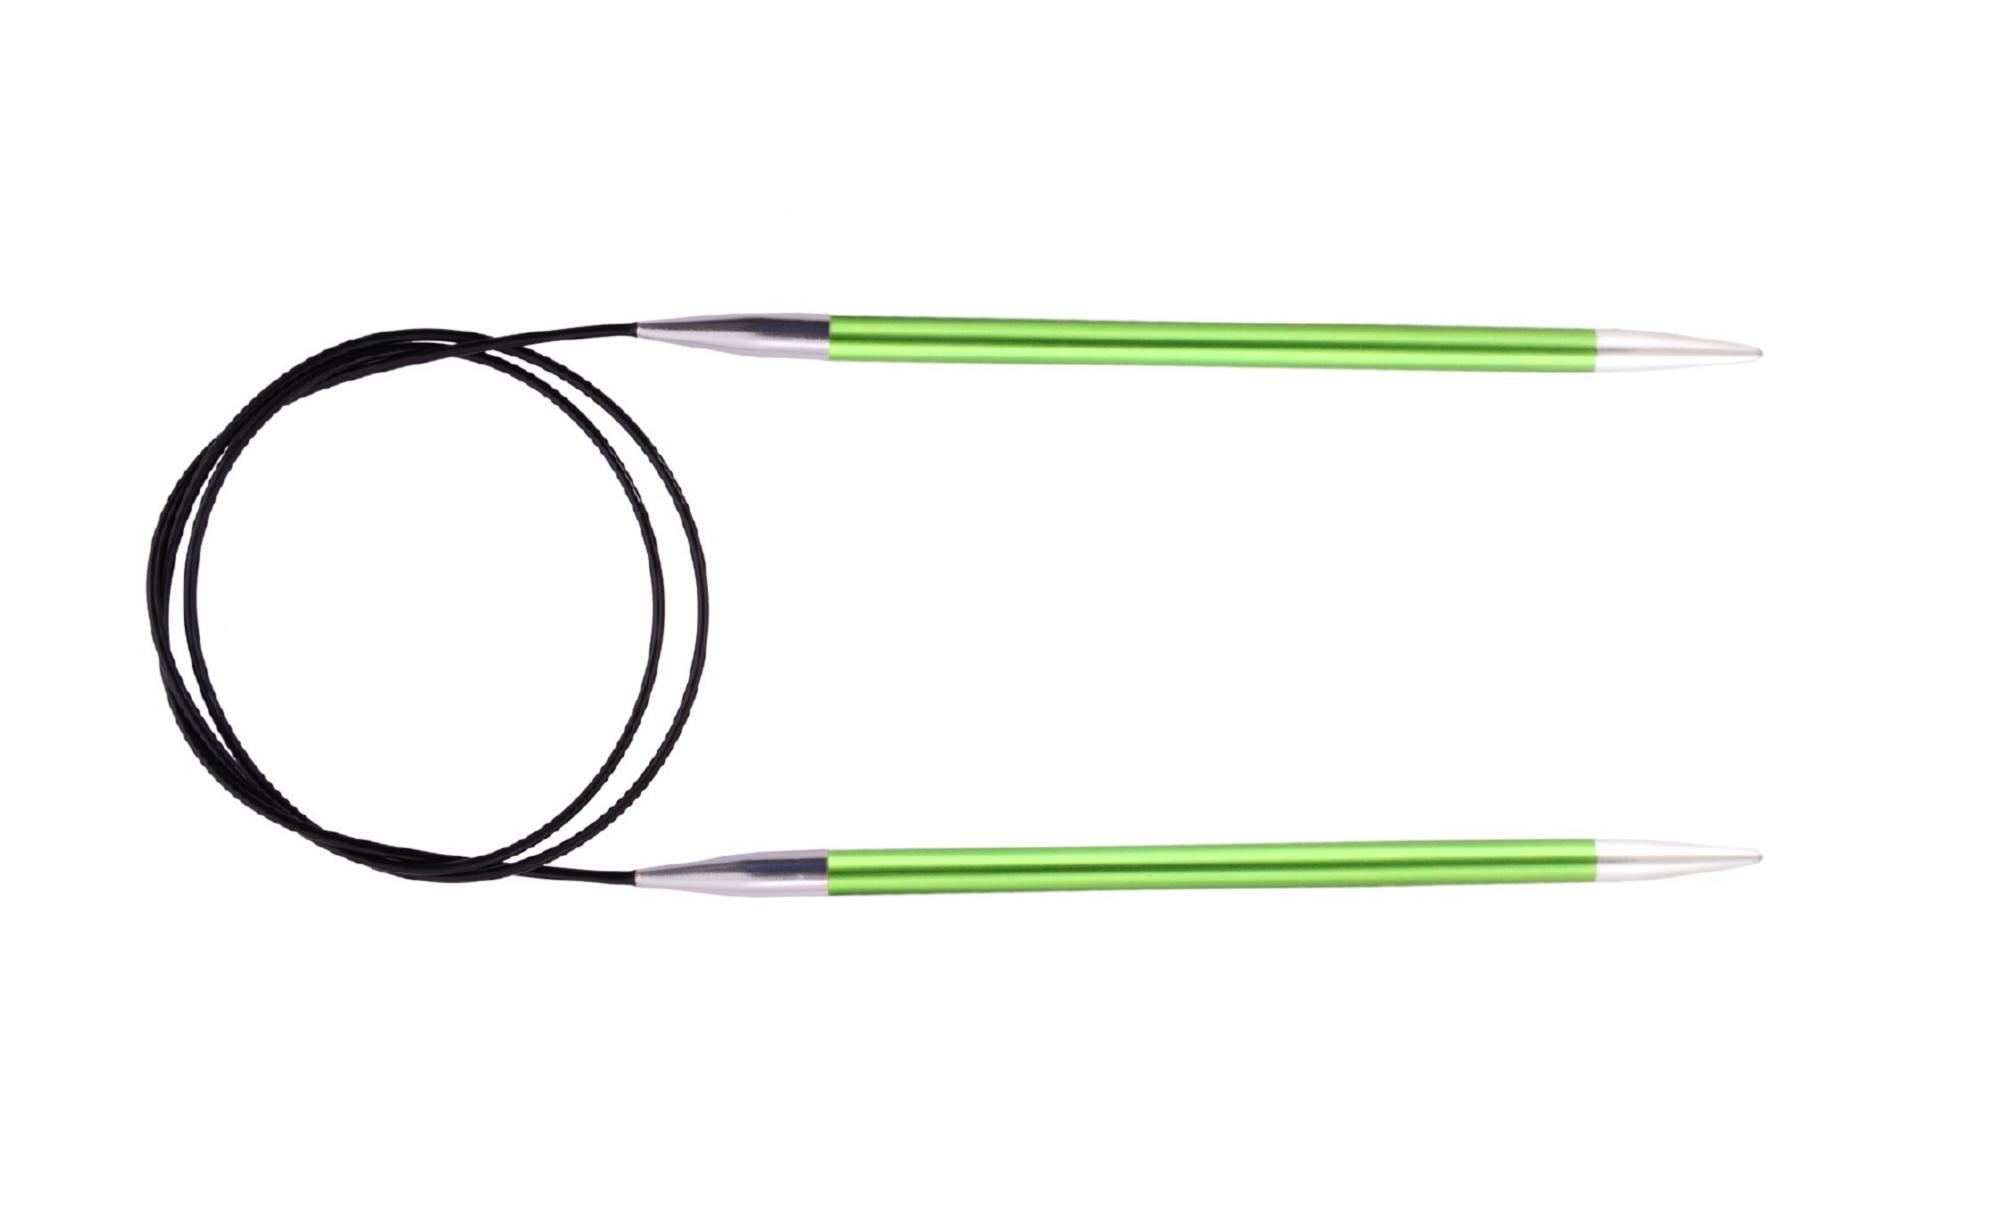 Спицы круговые 120 см Zing KnitPro, 47187, 3.50 мм